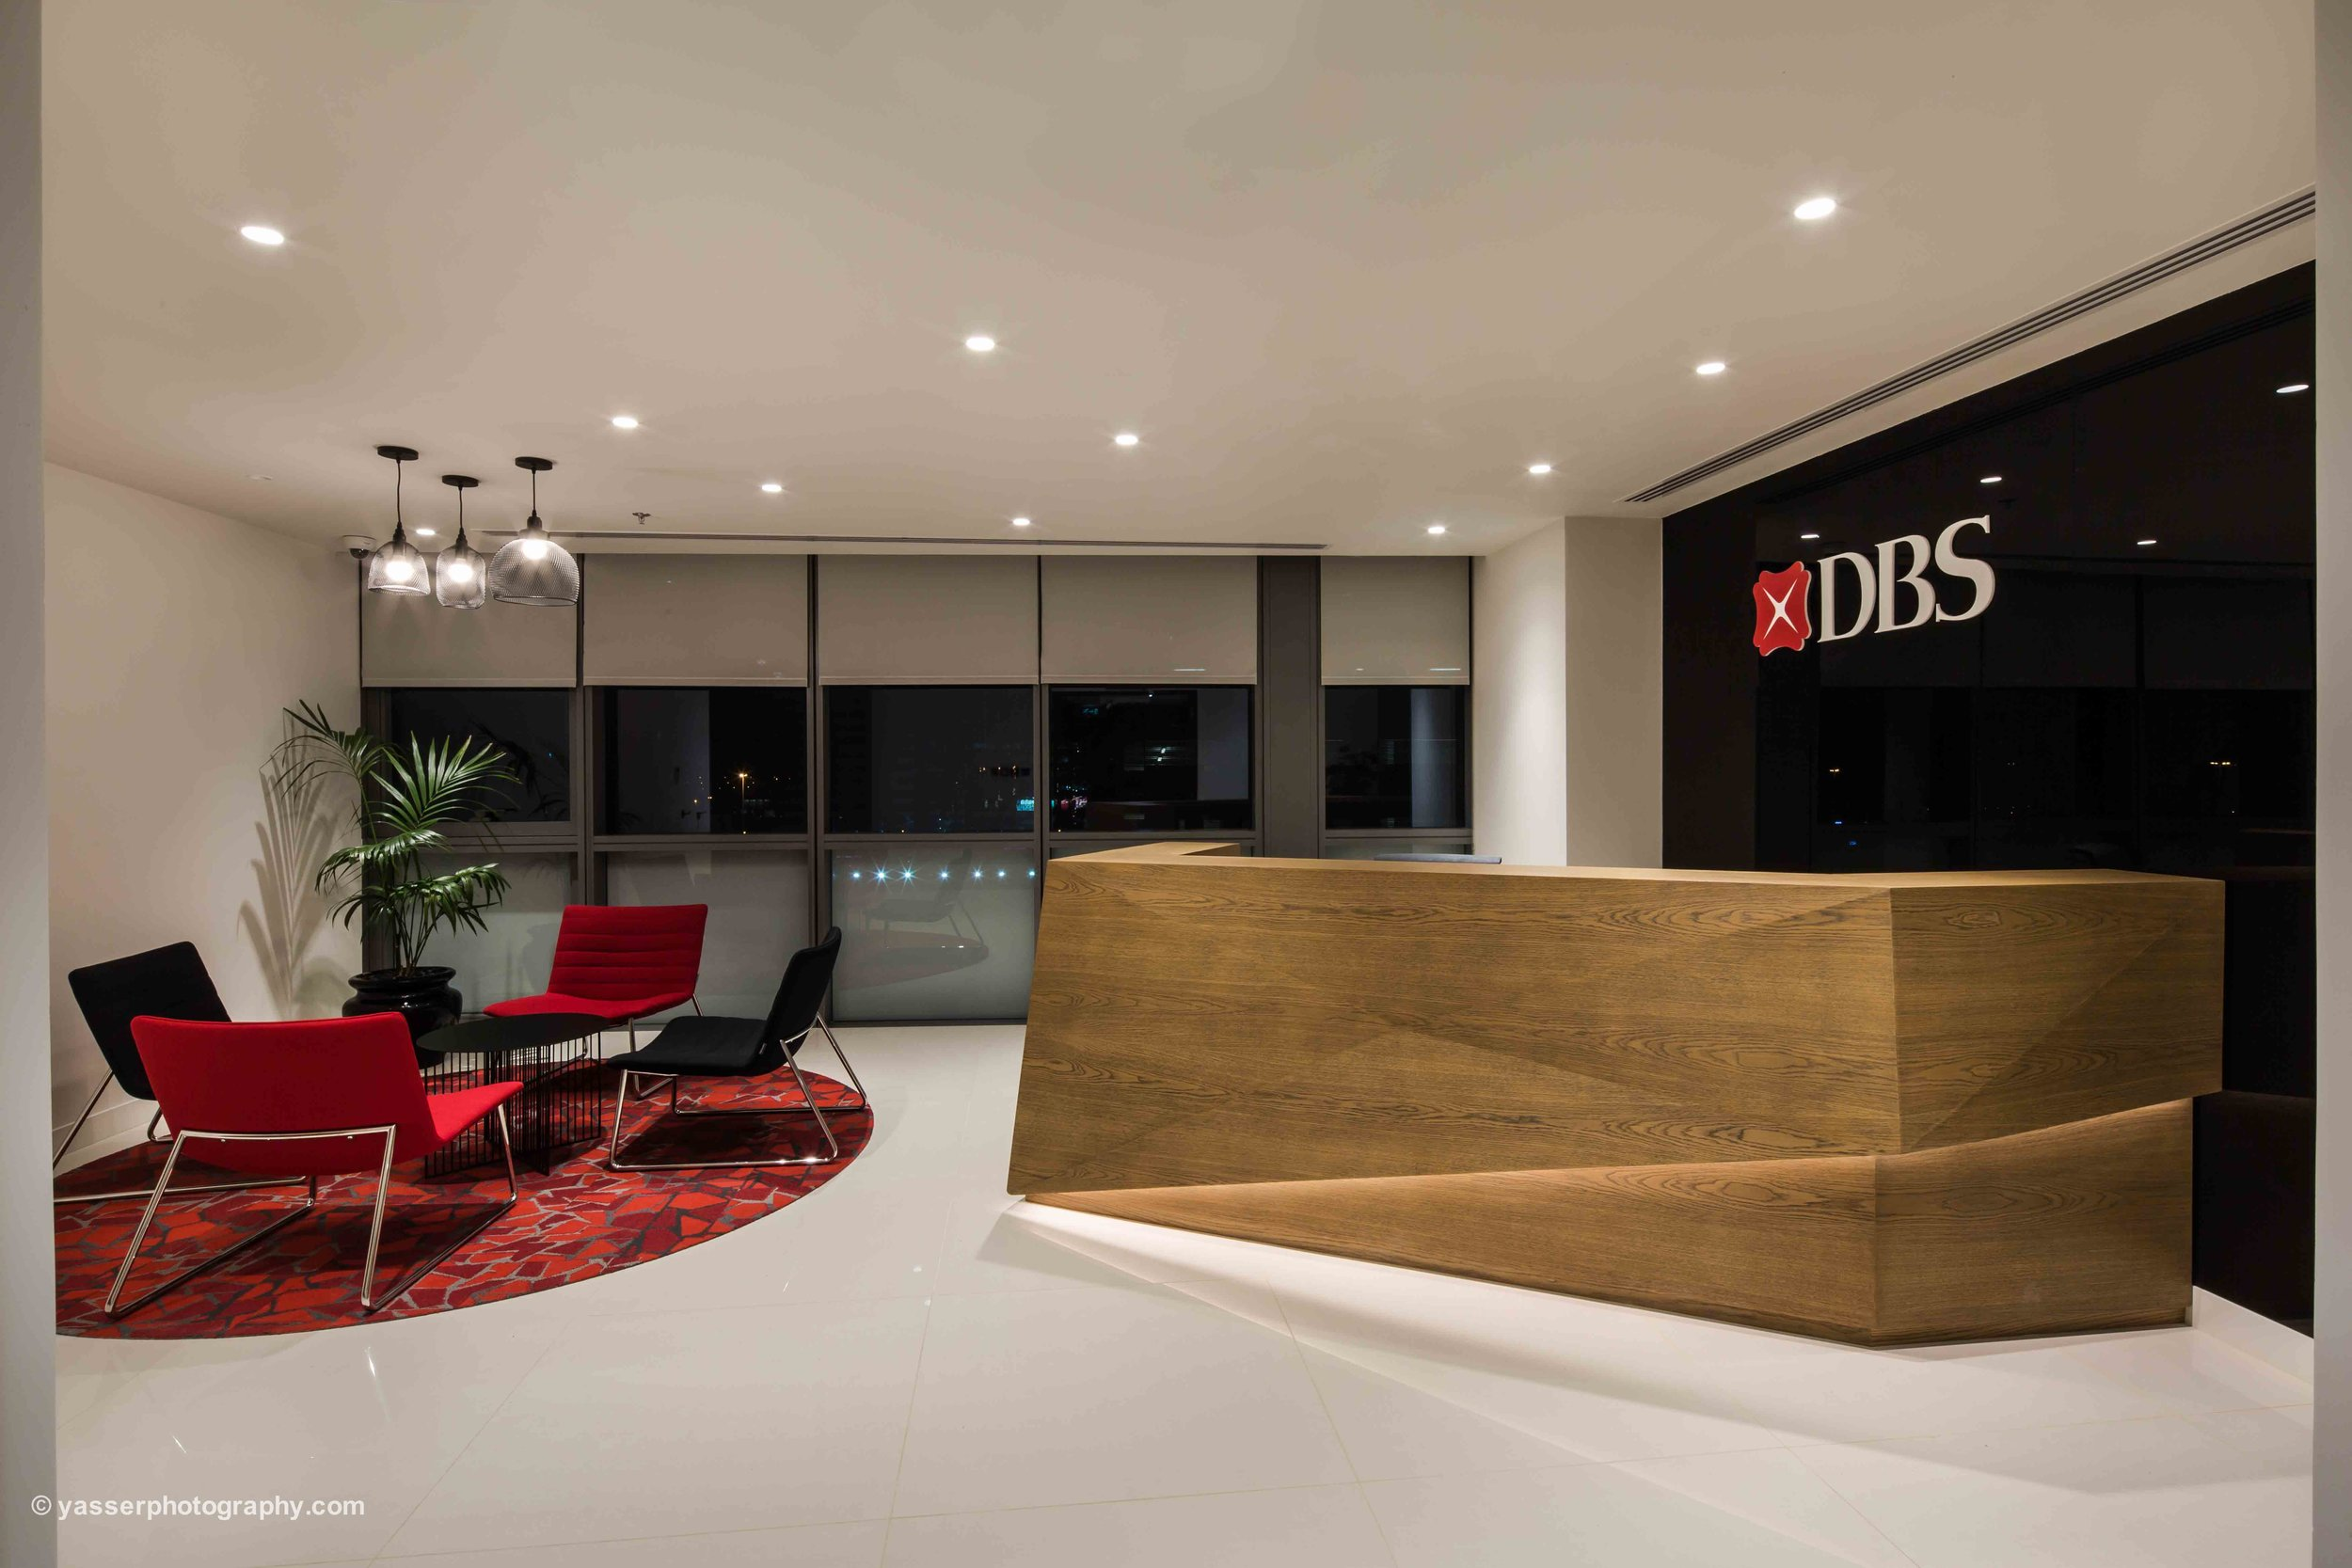 + DBS BANK